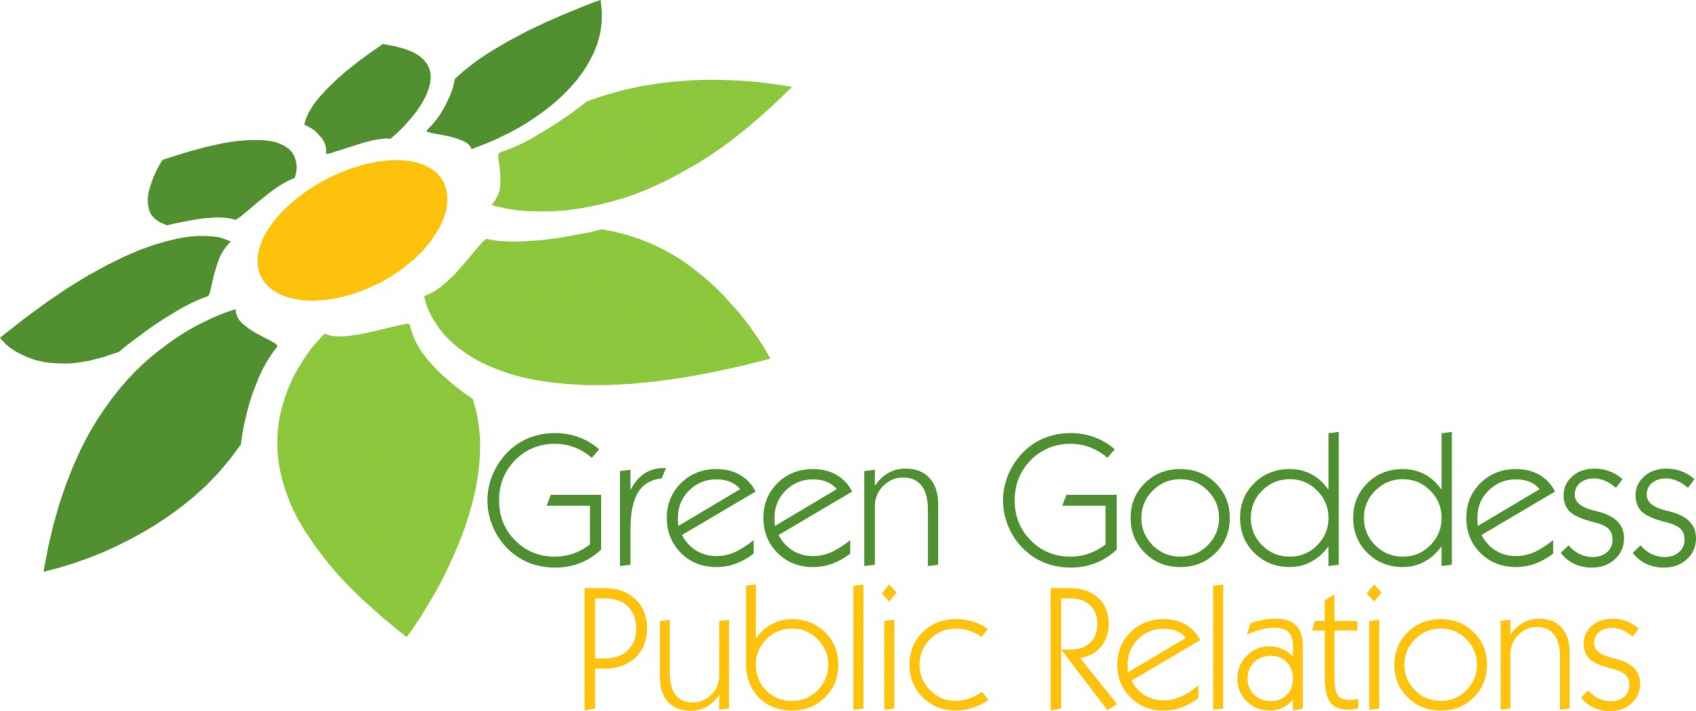 GreenGoddessPR Logo